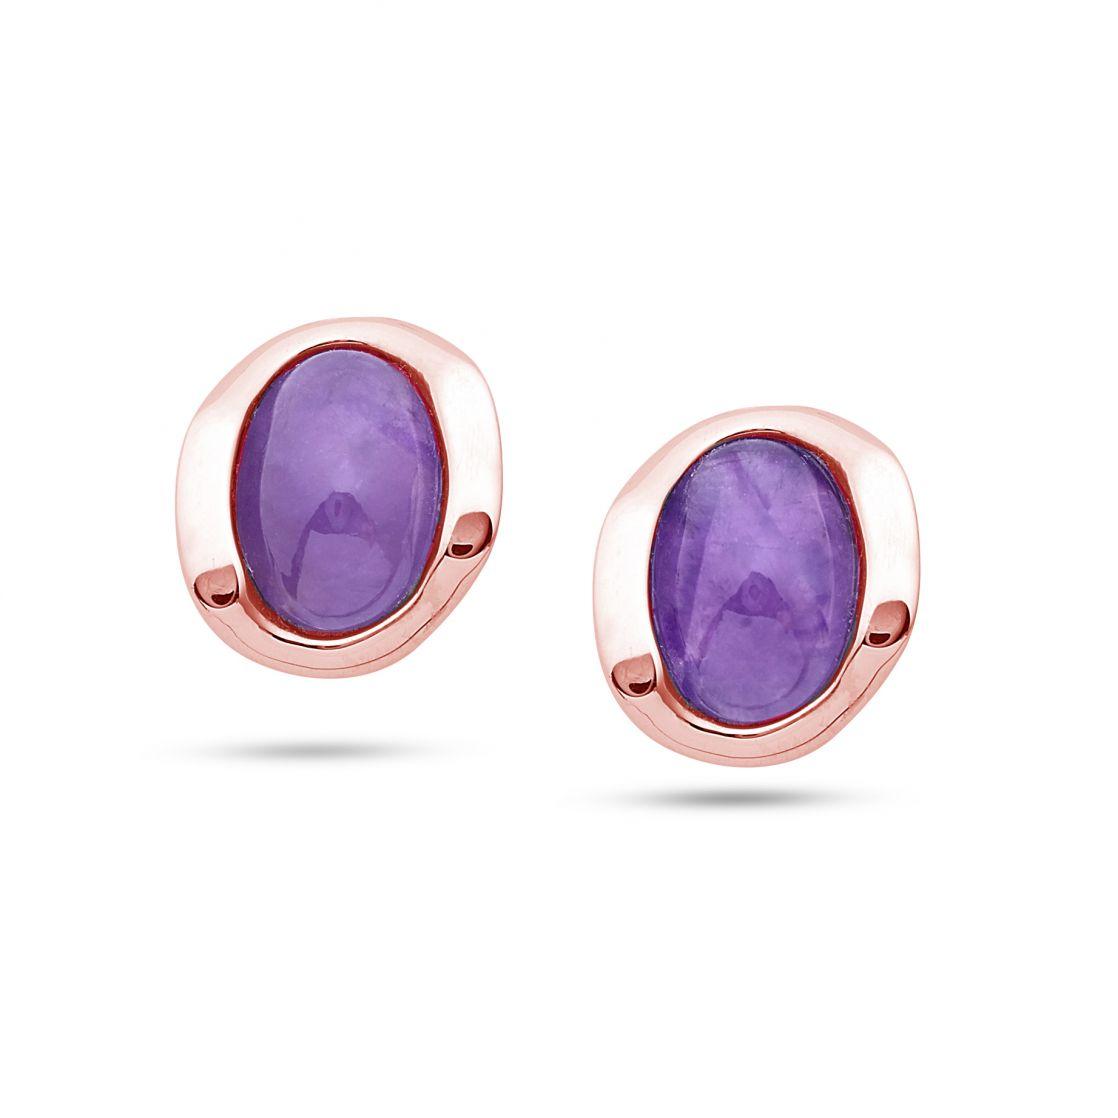 Stud earrings with amethyst